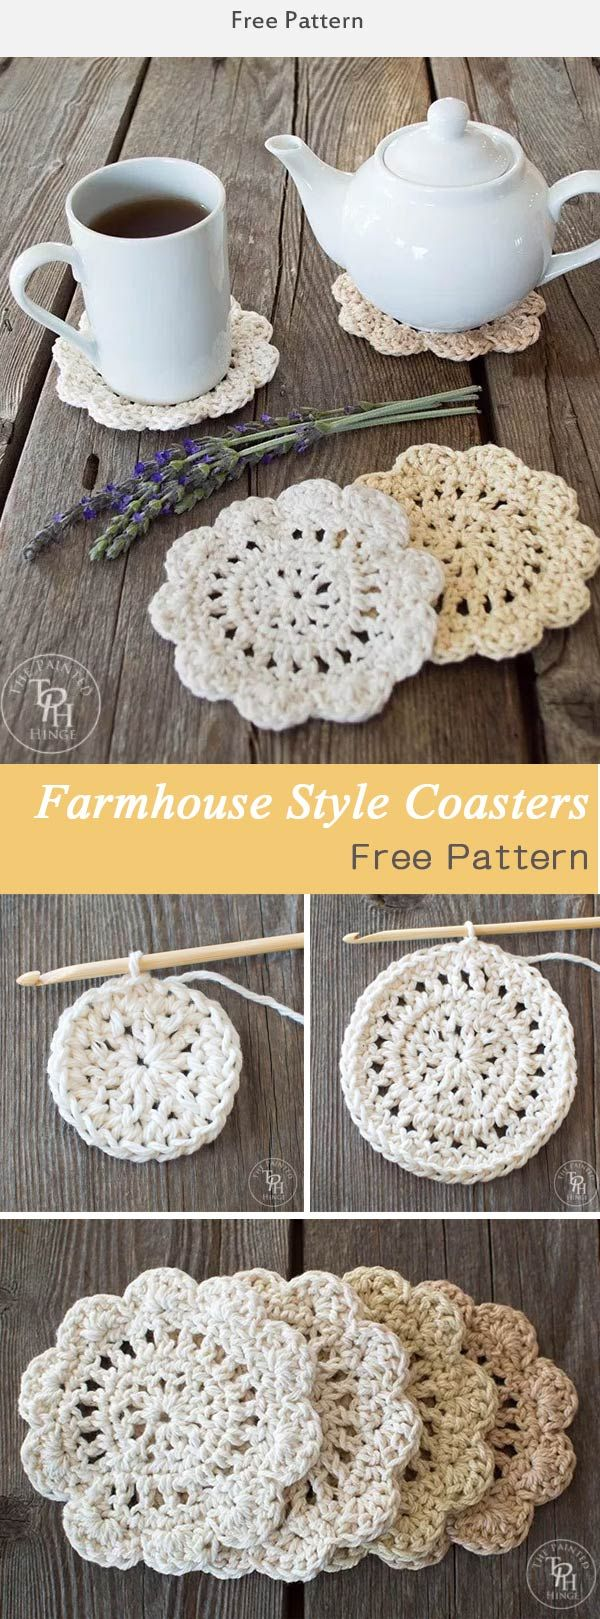 Farmhouse Style Coasters Crochet Free Pattern   grannys   Pinterest ...